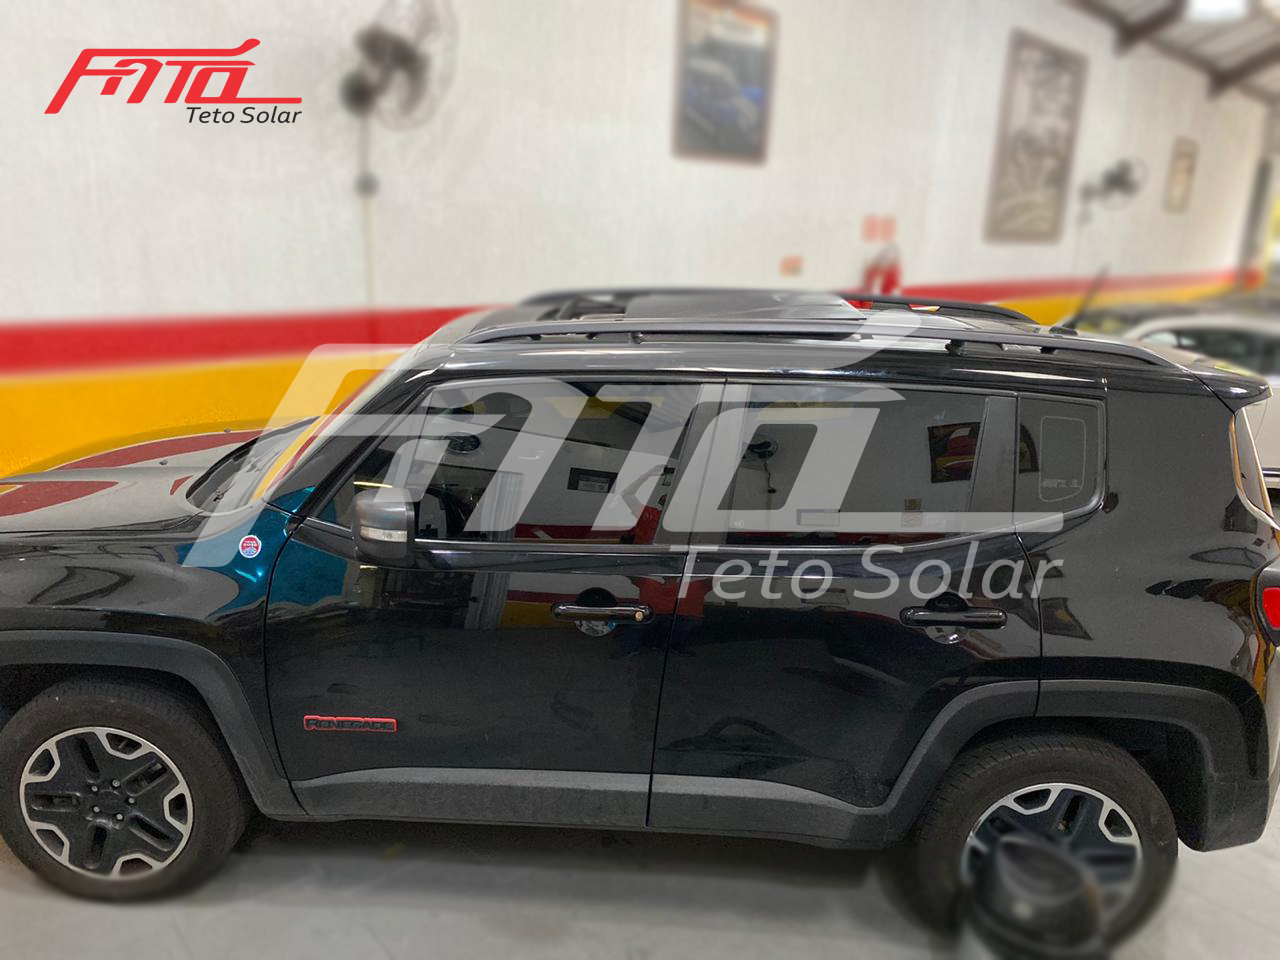 Conserto do Teto Solar no Jeep